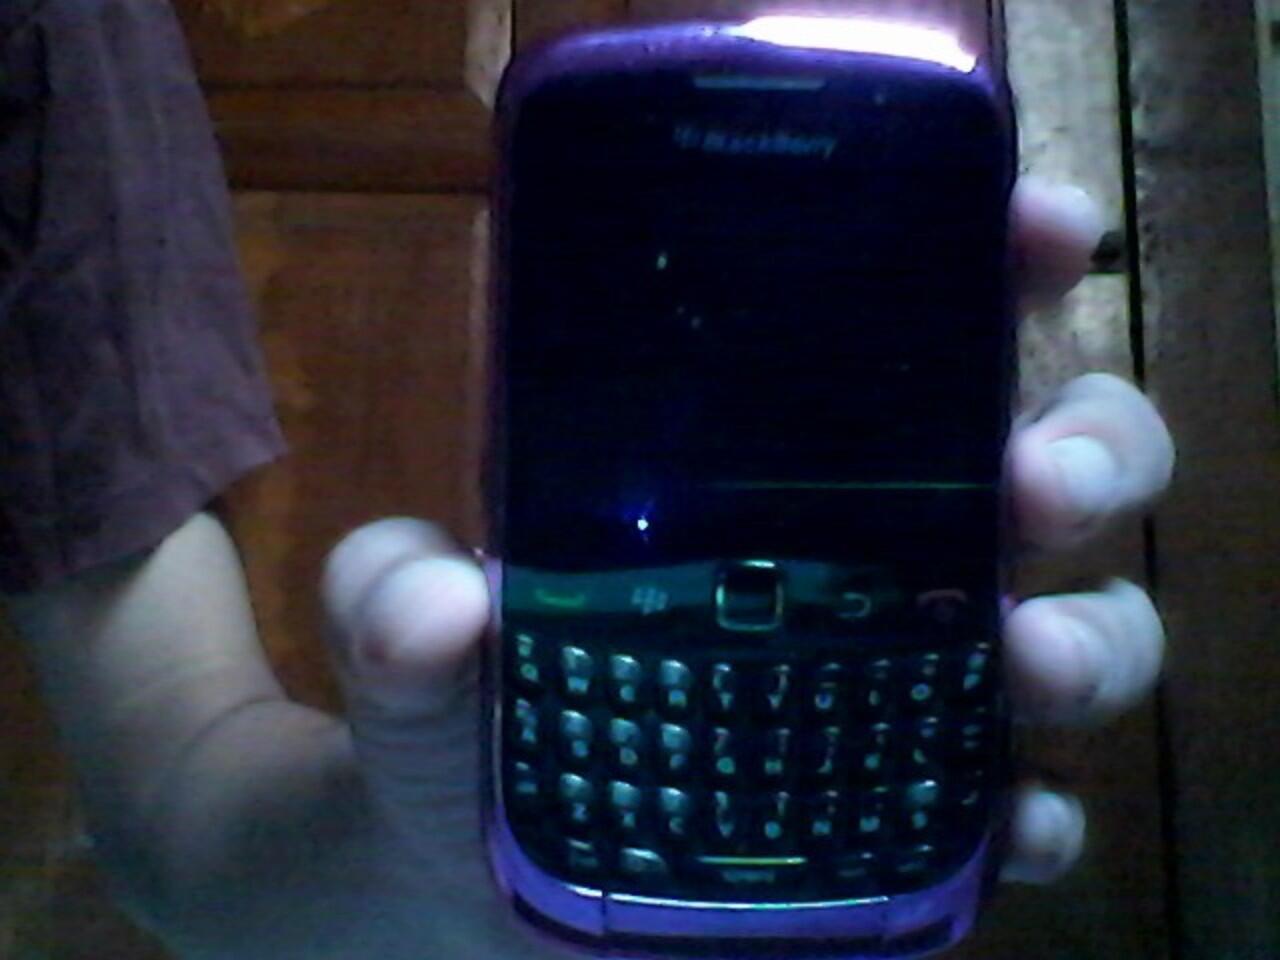 blackberry 9330 jupiter mulus